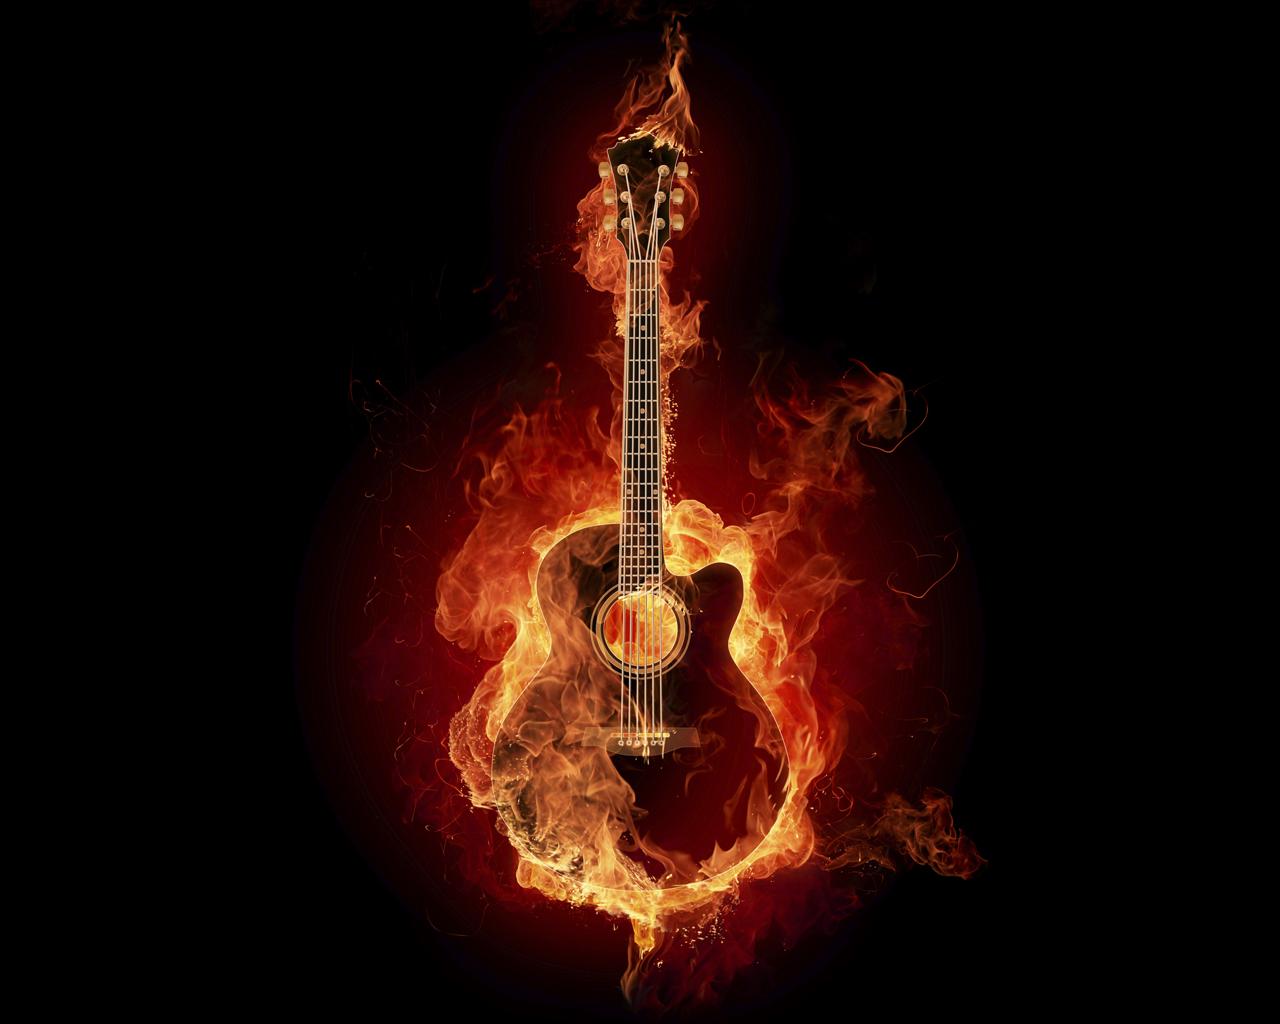 http://4.bp.blogspot.com/-728wh5bHT1Q/T-oasDy_-hI/AAAAAAAAAwI/mFrOdOGj8VA/s1600/Funny_wallpapers_Creative_Wallpaper_Guitar_is_on_fire_013663_.jpg